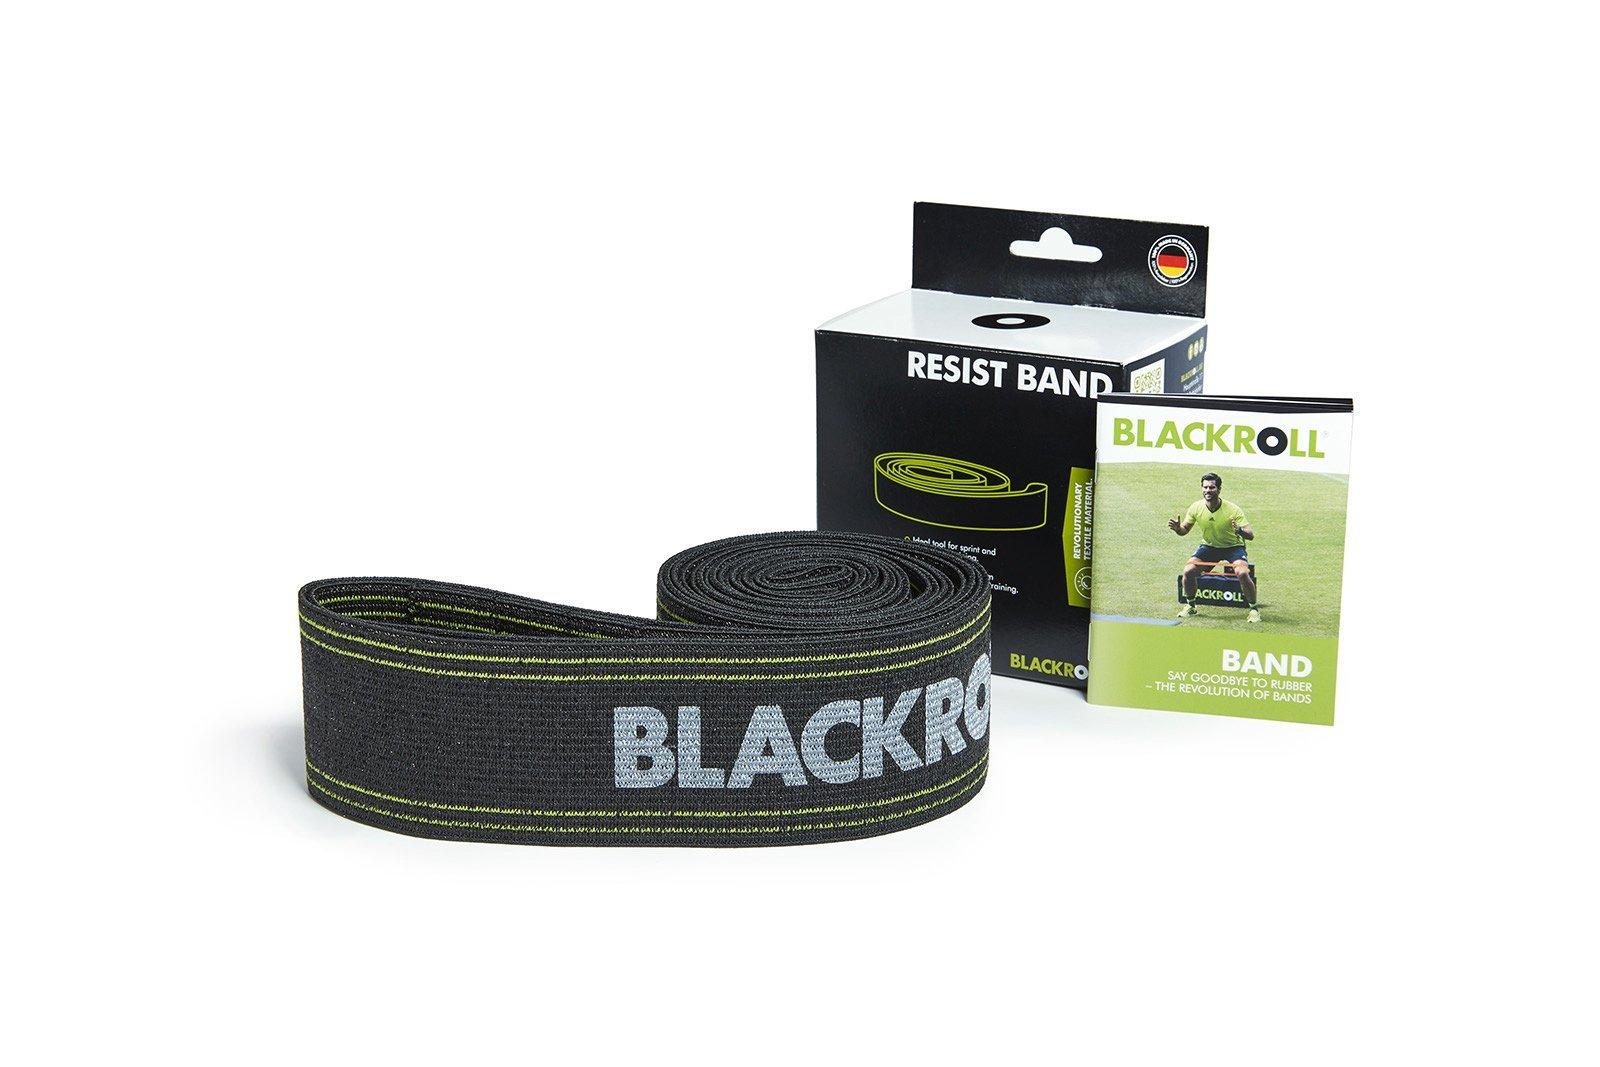 Blackroll Resist Band Sort Træningselastik